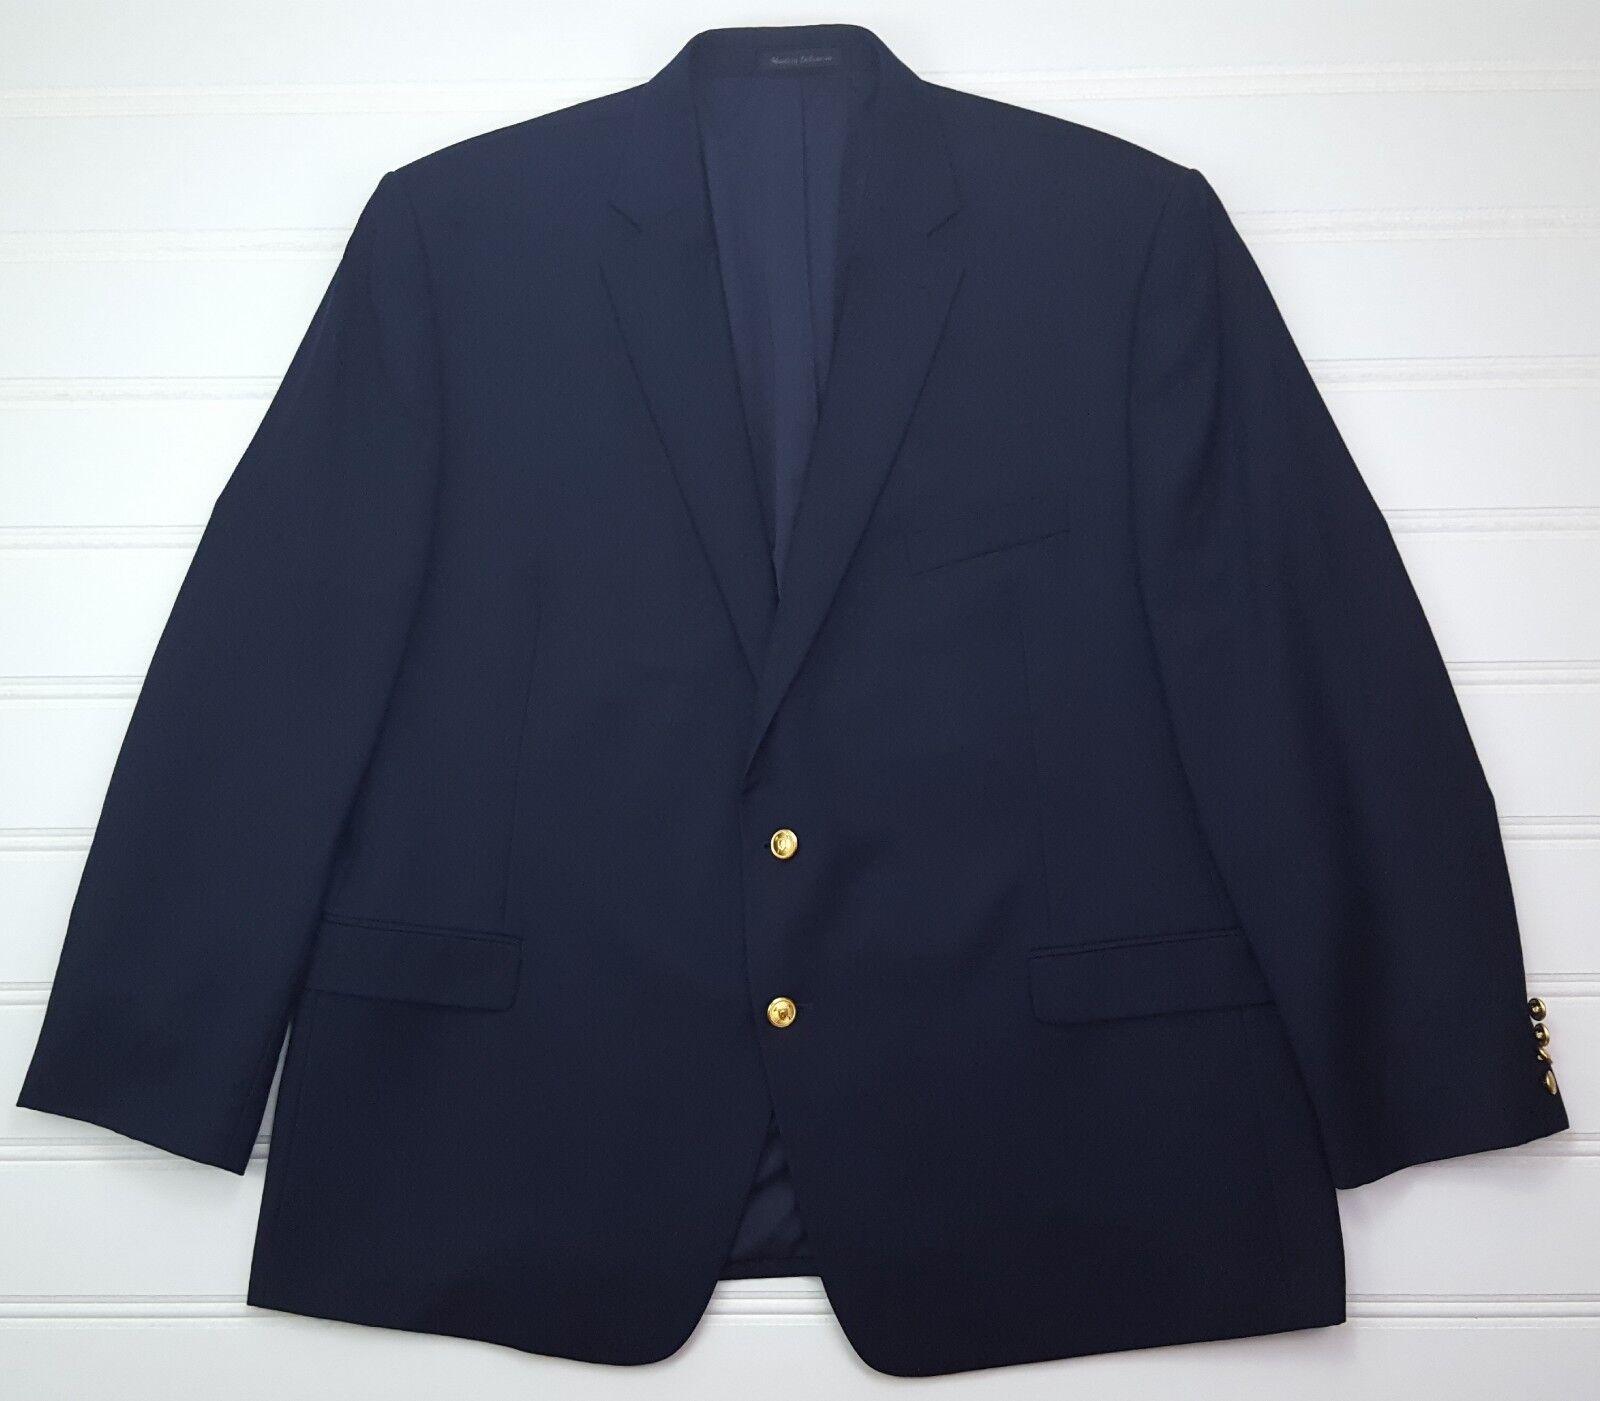 Lauren Ralph Lauren Blau Blazer 50R Navy Wool Gold Toned Metal Buttons Lined Man